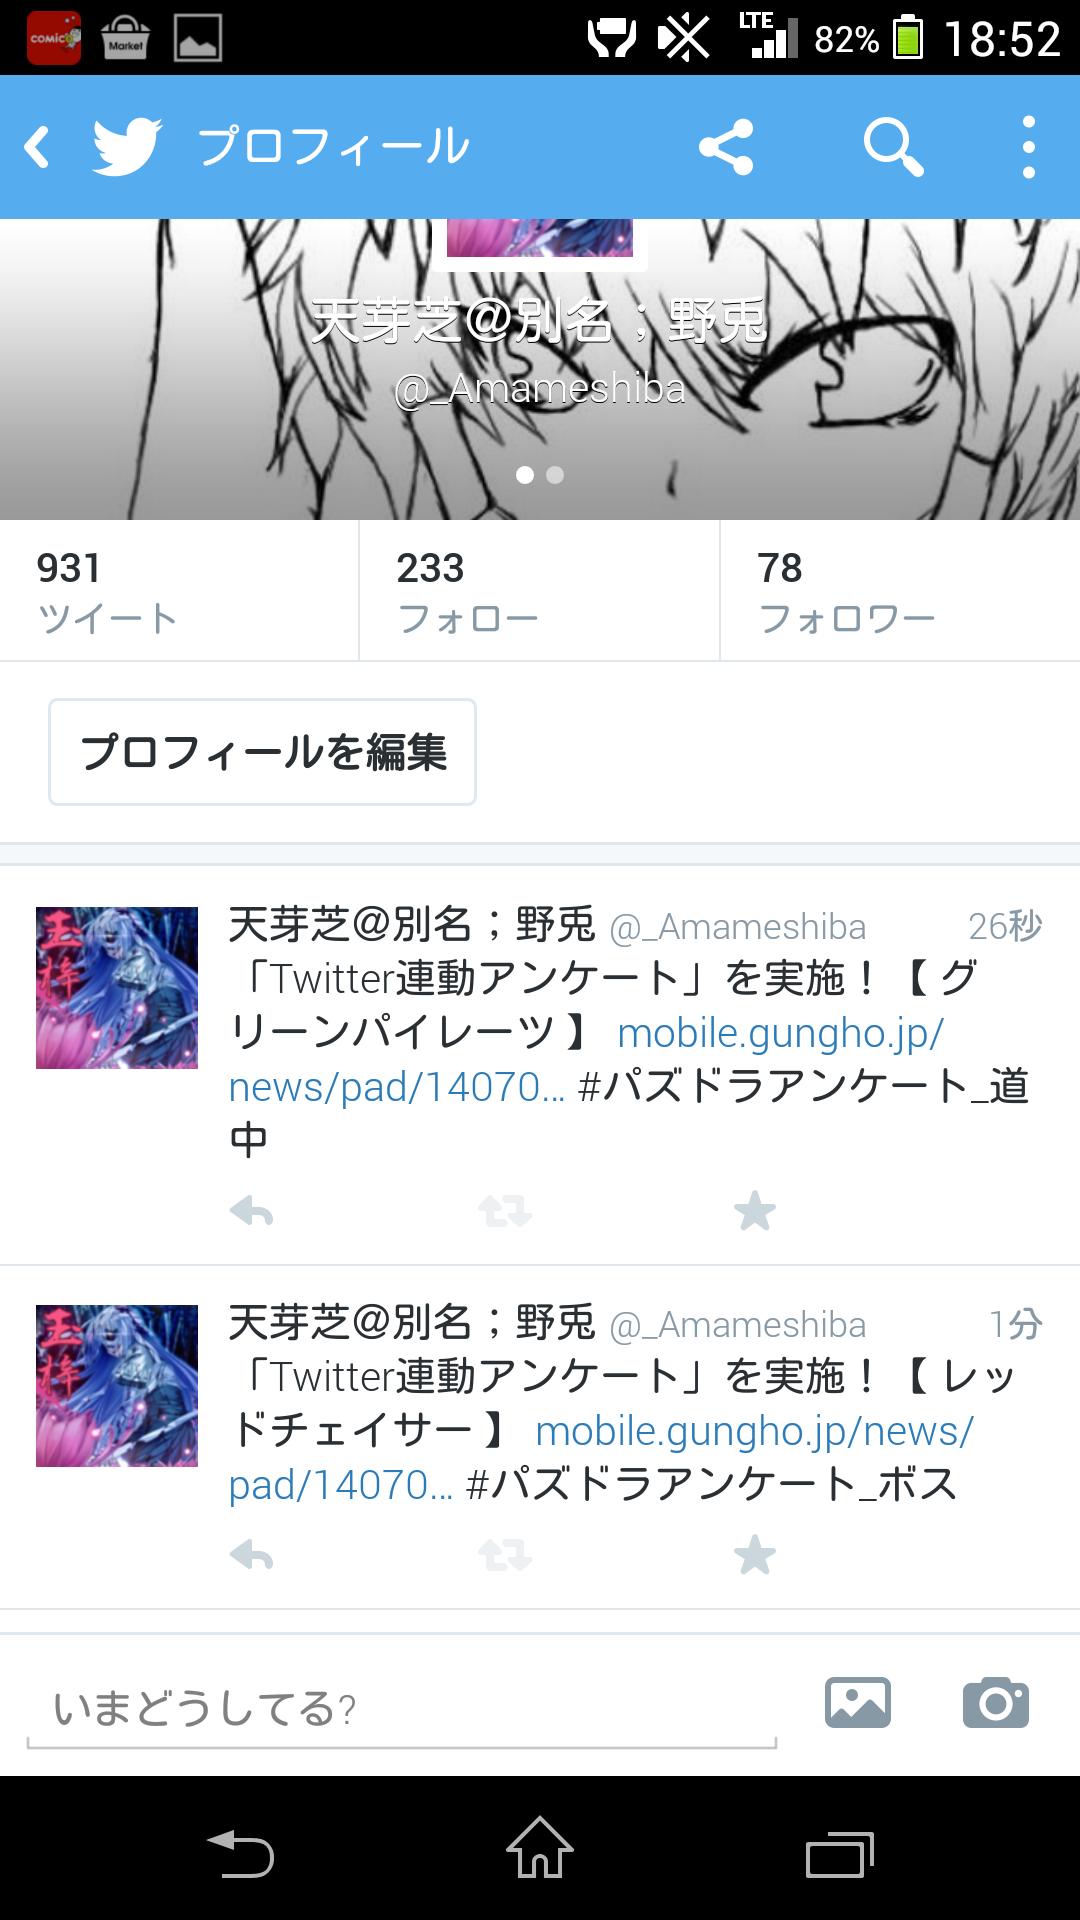 Screenshot_2014-07-04-18-52-27.png